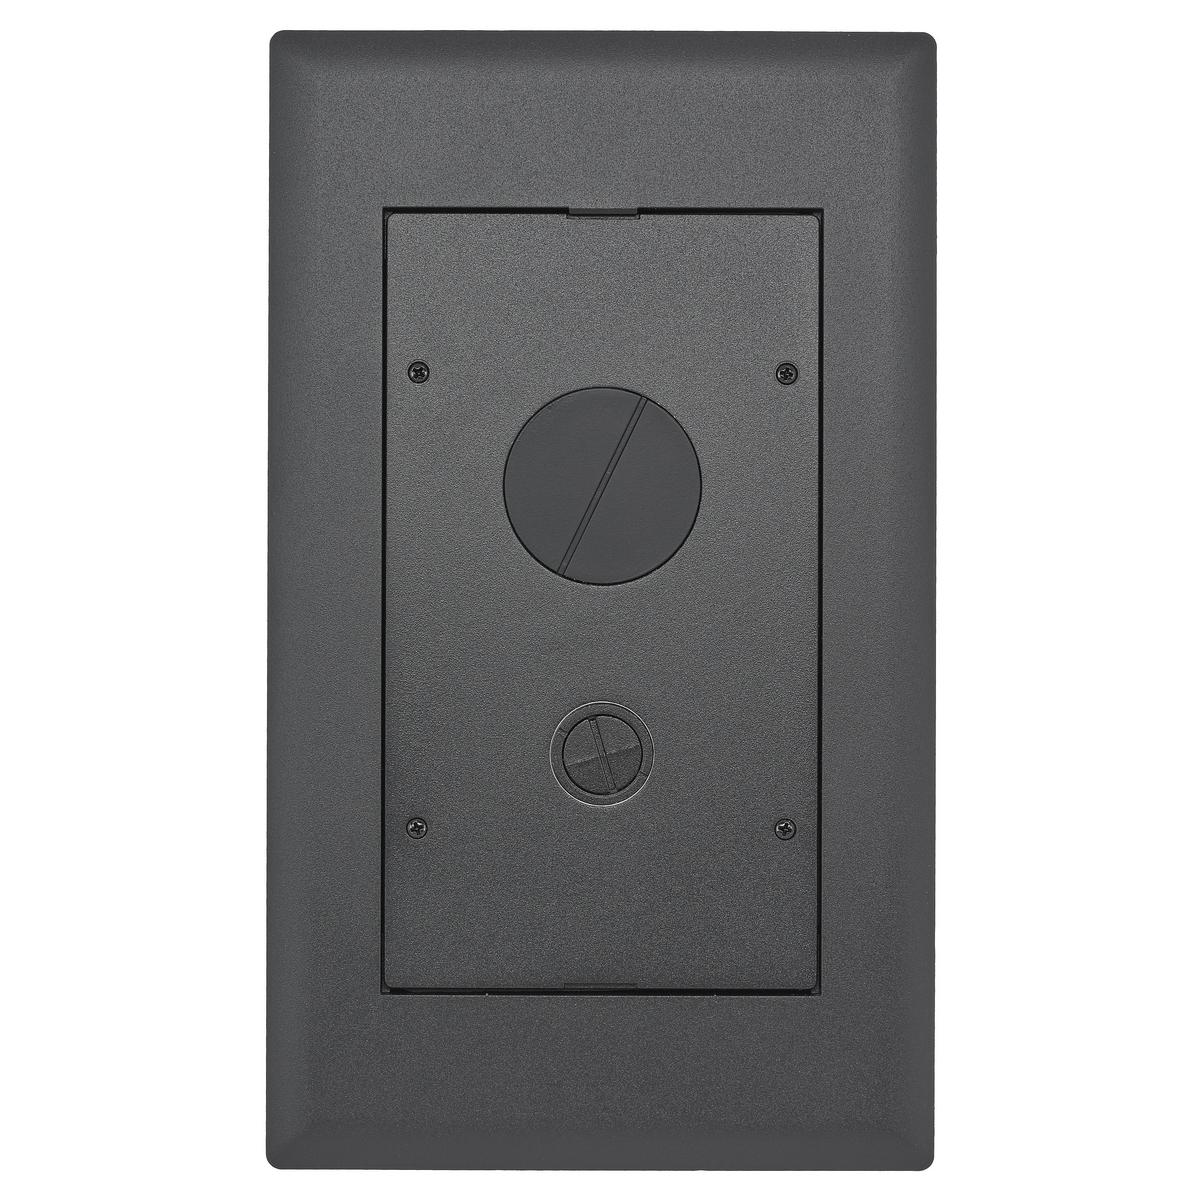 Wall Plates And Covers United Electric 15 20 Amp Gfi Gfci Receptacle Brown Black Gray Almond Ivory White Hub2gafbffcvrbk Afb Ff Cvr 2g Powder 2gafbffcvrbk Hubbell